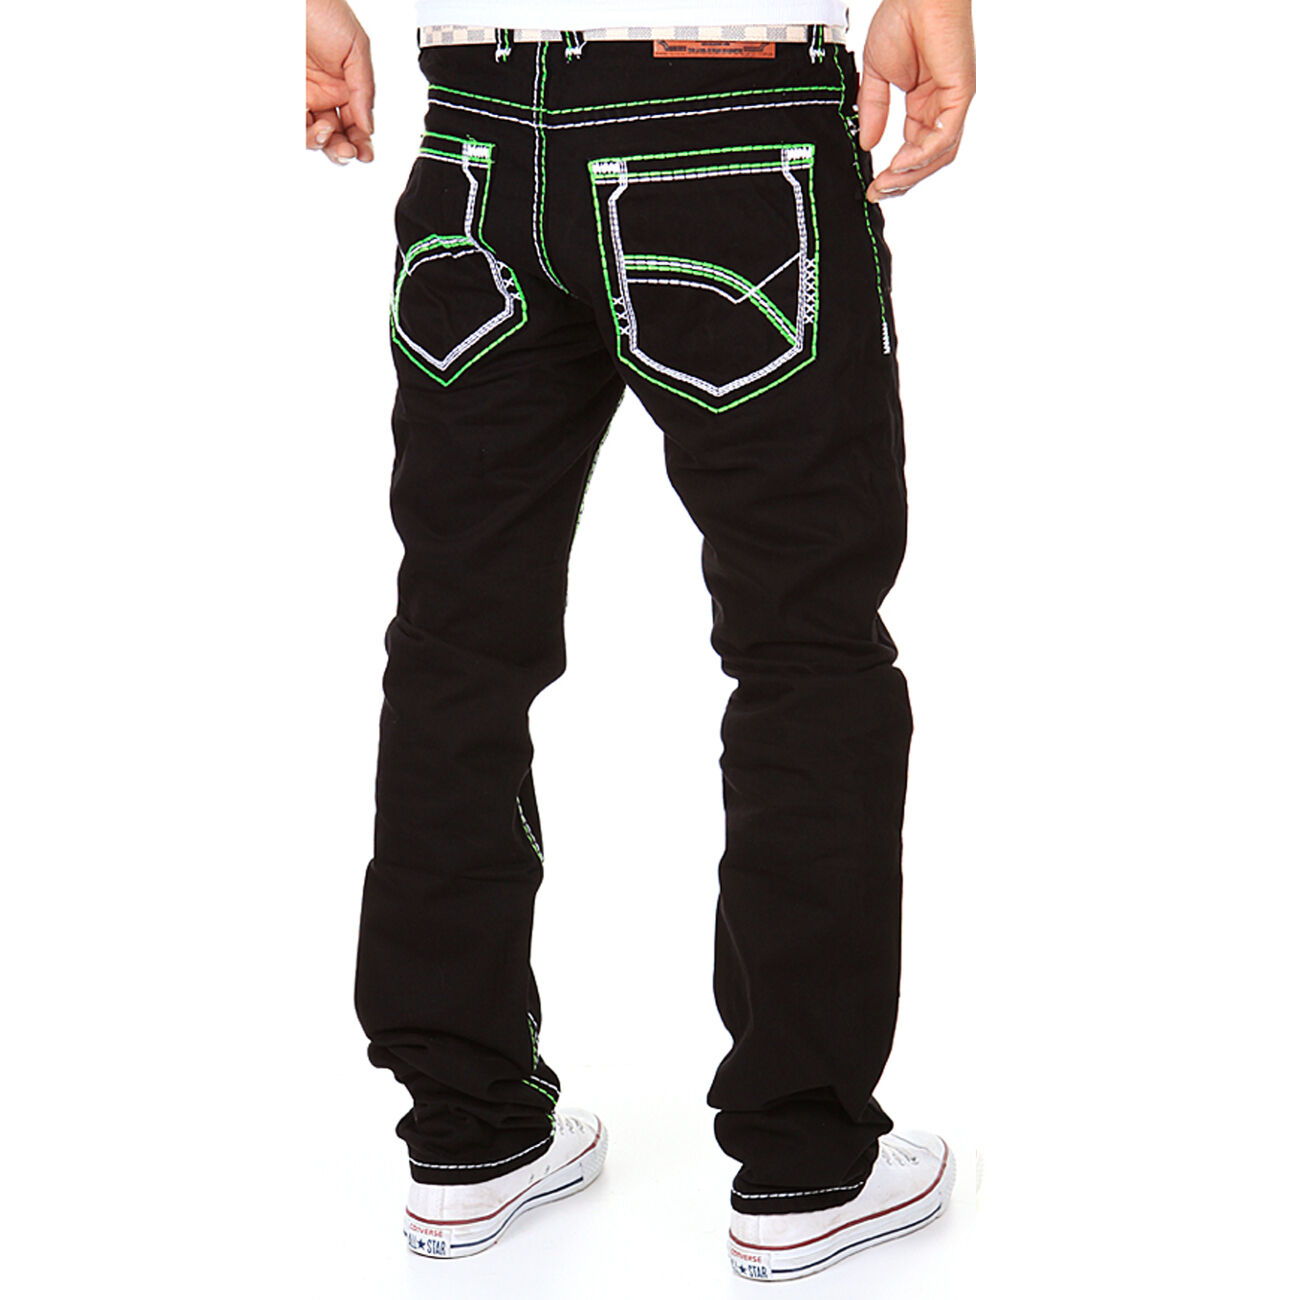 Zahida Jeans men Pantaloni Cuciture Spesse Abbigliamento Discoteca black green